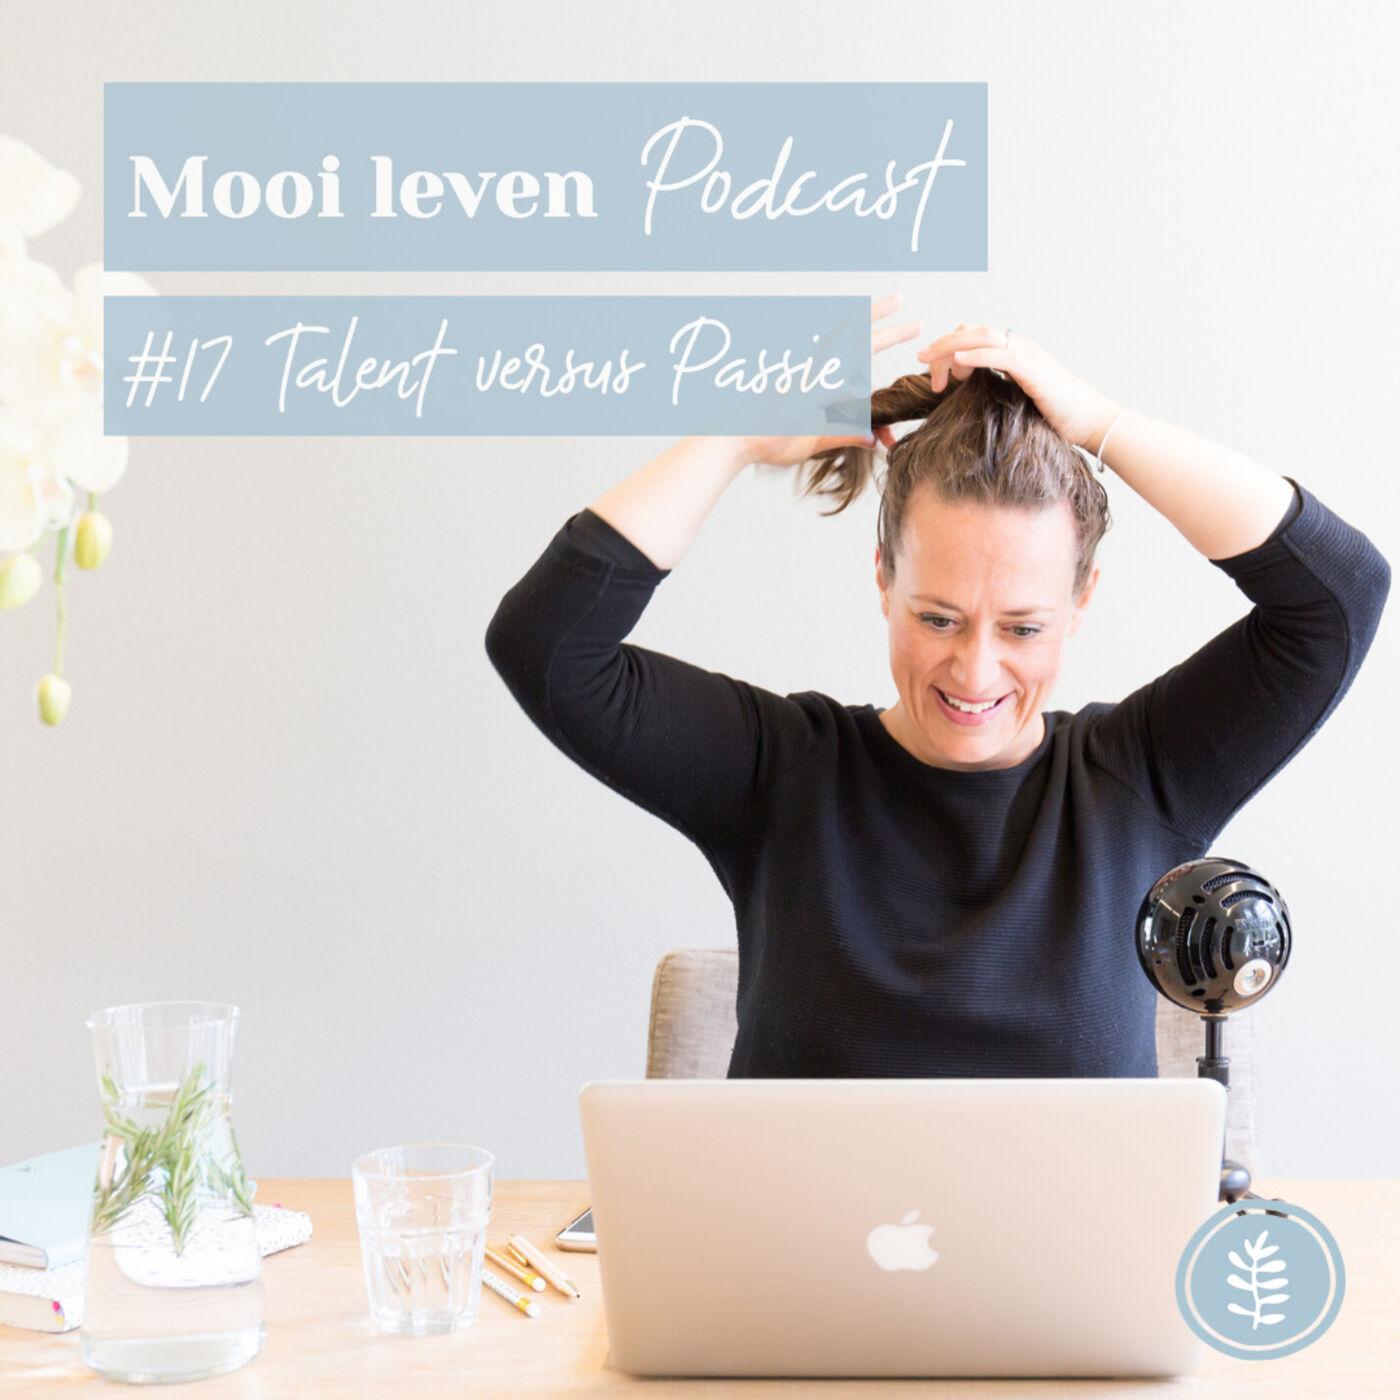 Mooi Leven Podcast #17 | Talent versus Passie